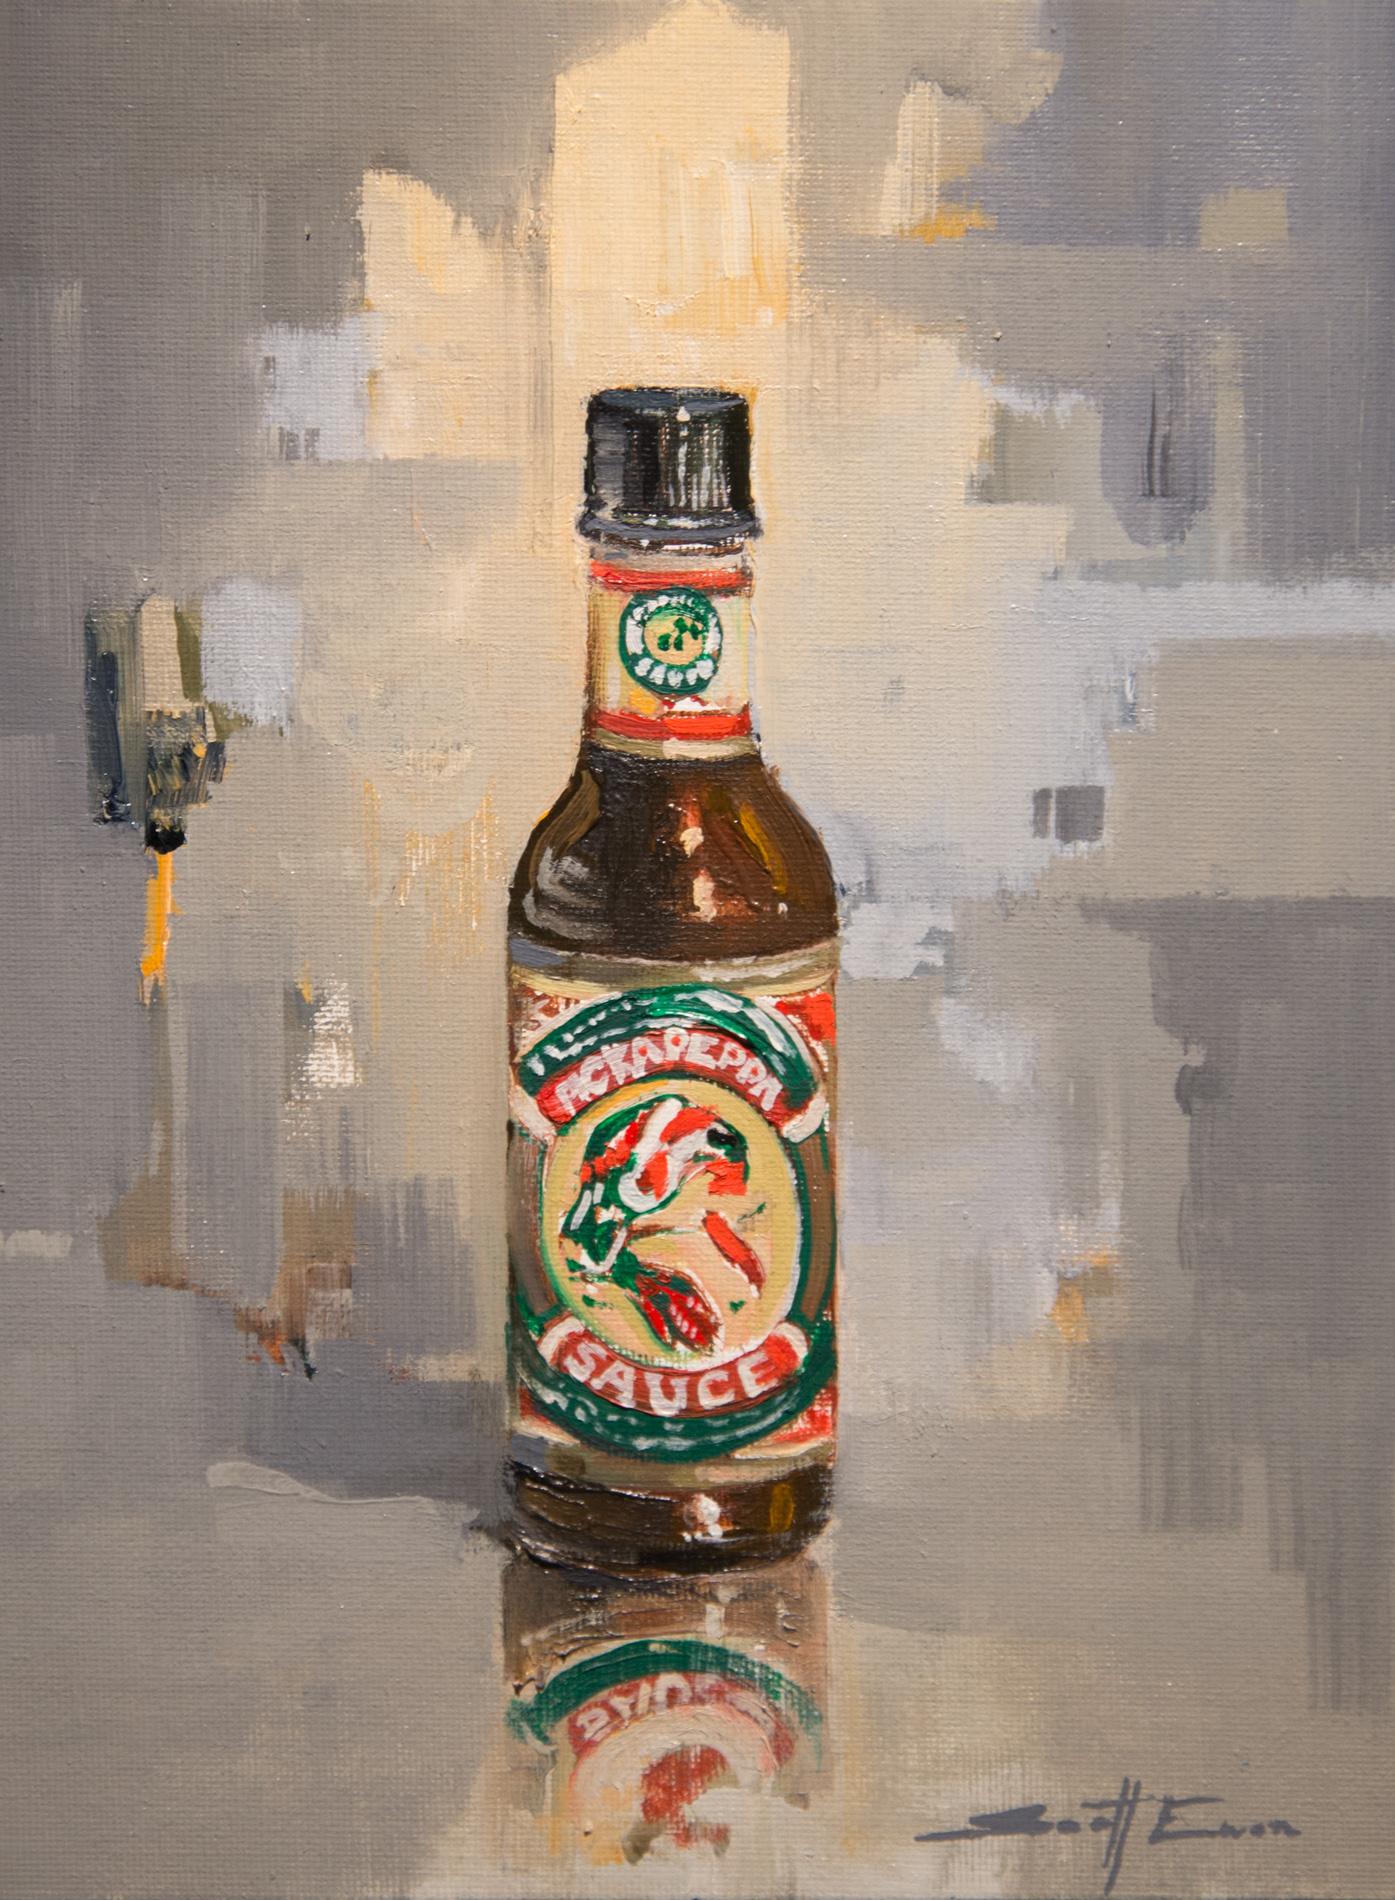 Bottle of Pickappepa Sauce